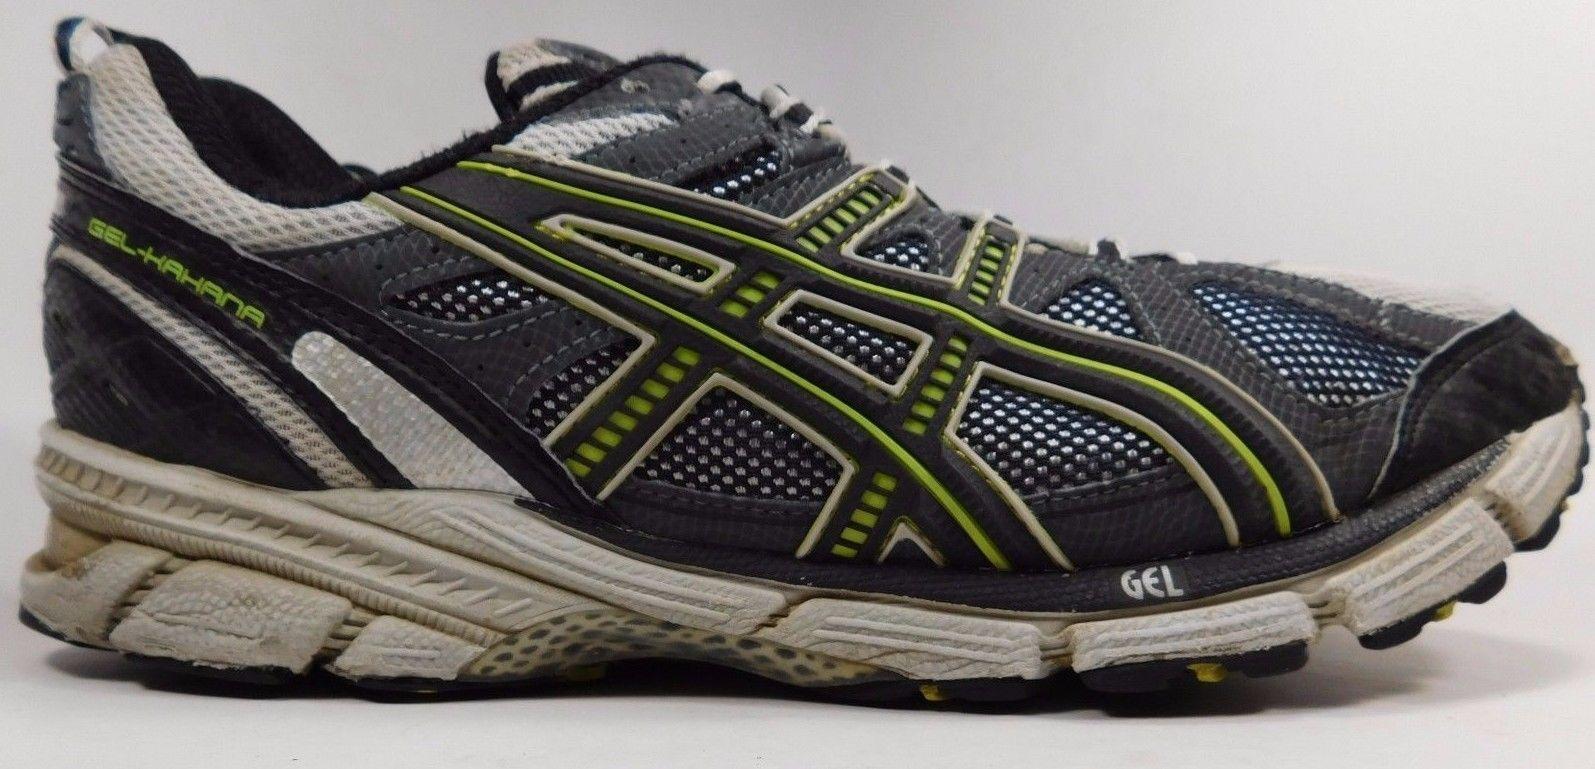 Asics Gel Kahana 4 Men's Trail Running Shoes Size US 14 M (D) EU 49 Gray T0E0N